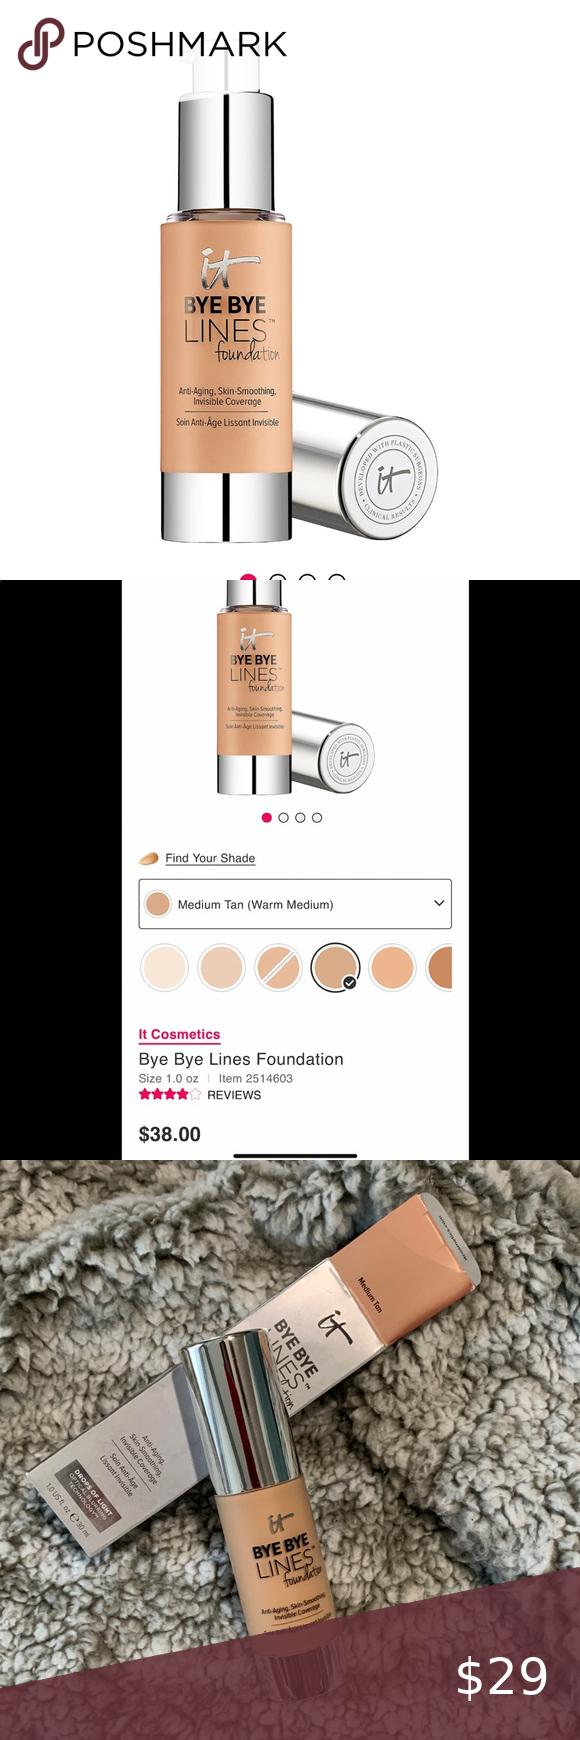 It cosmetics Bye Bye Lines Foundation medium tan in 2020